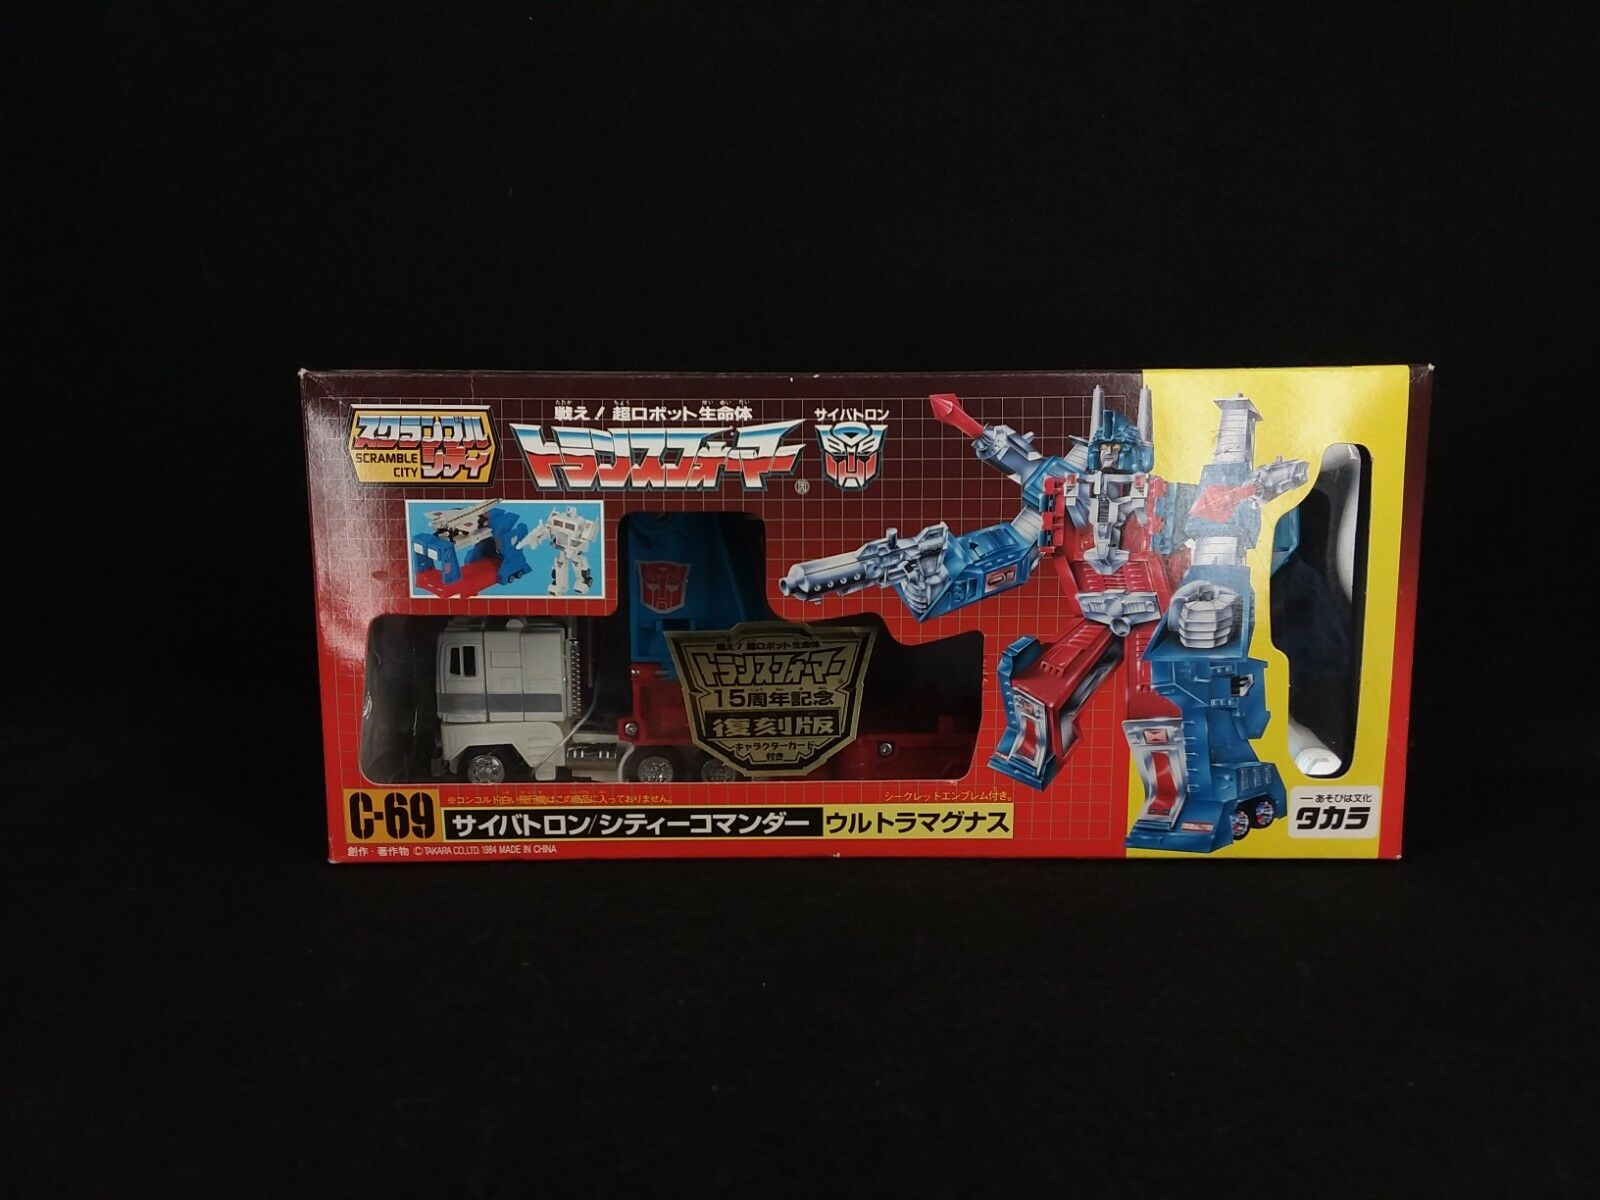 Transformers G1 15th Anniversary Re-issue Ultra Magnus Scramble Stadt C-69 Takara